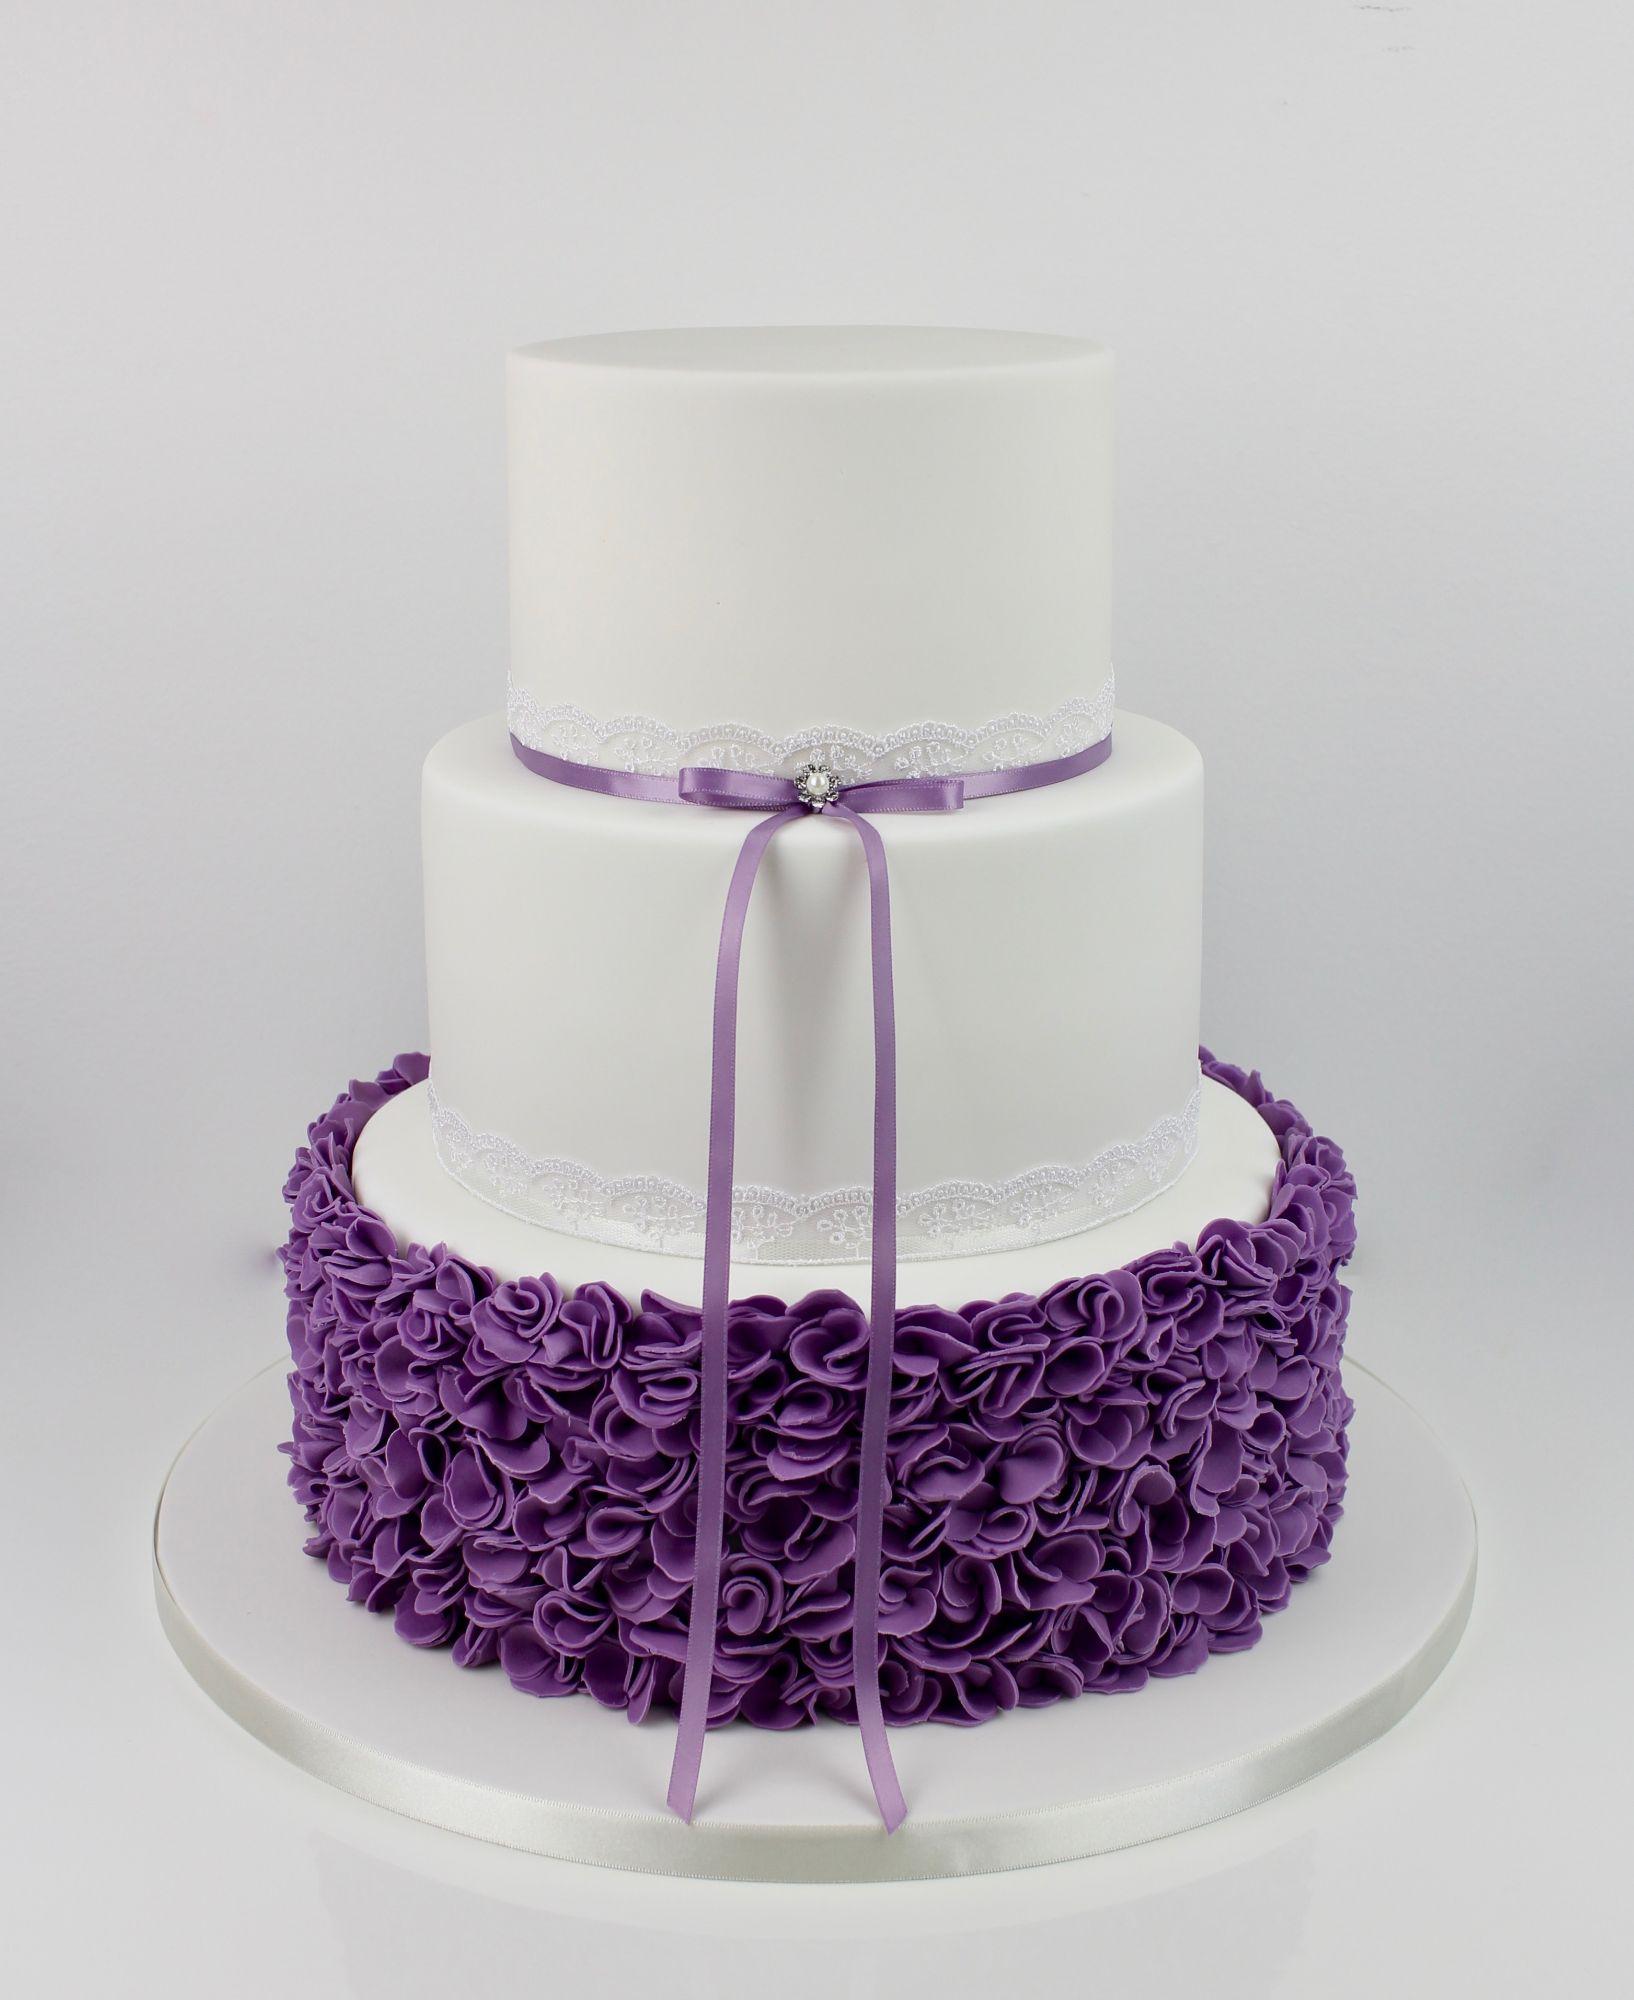 Purple scrunched icing ruffles